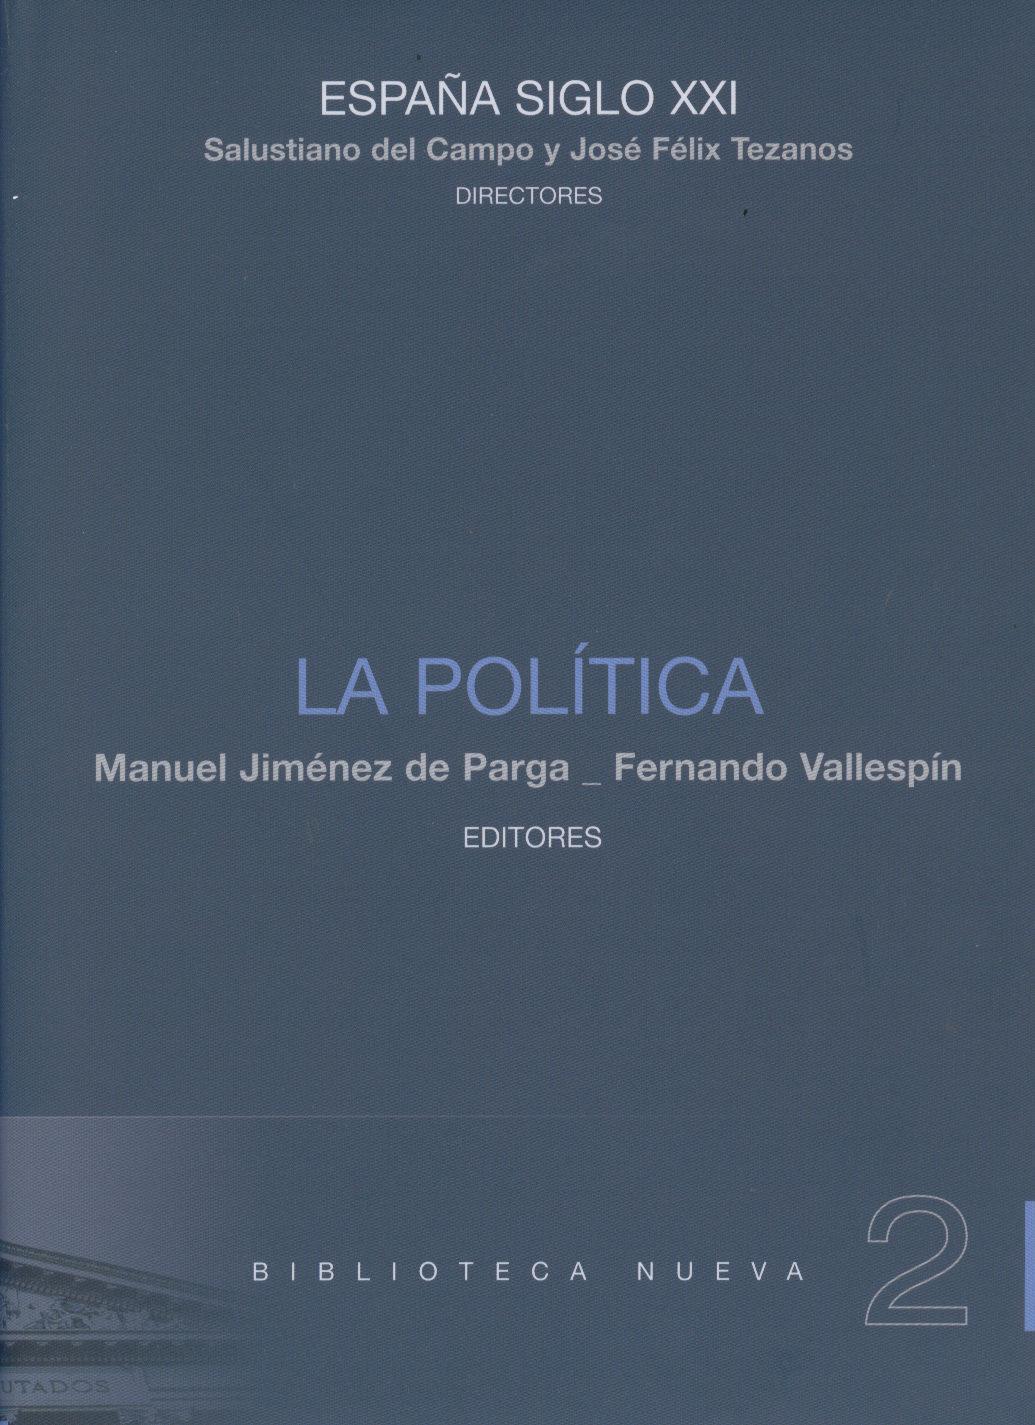 La Politica (españa Siglo Xxi. Vol. 2) por Fernando Vallespin;                                                                                    Manuel Jimenez De Parga